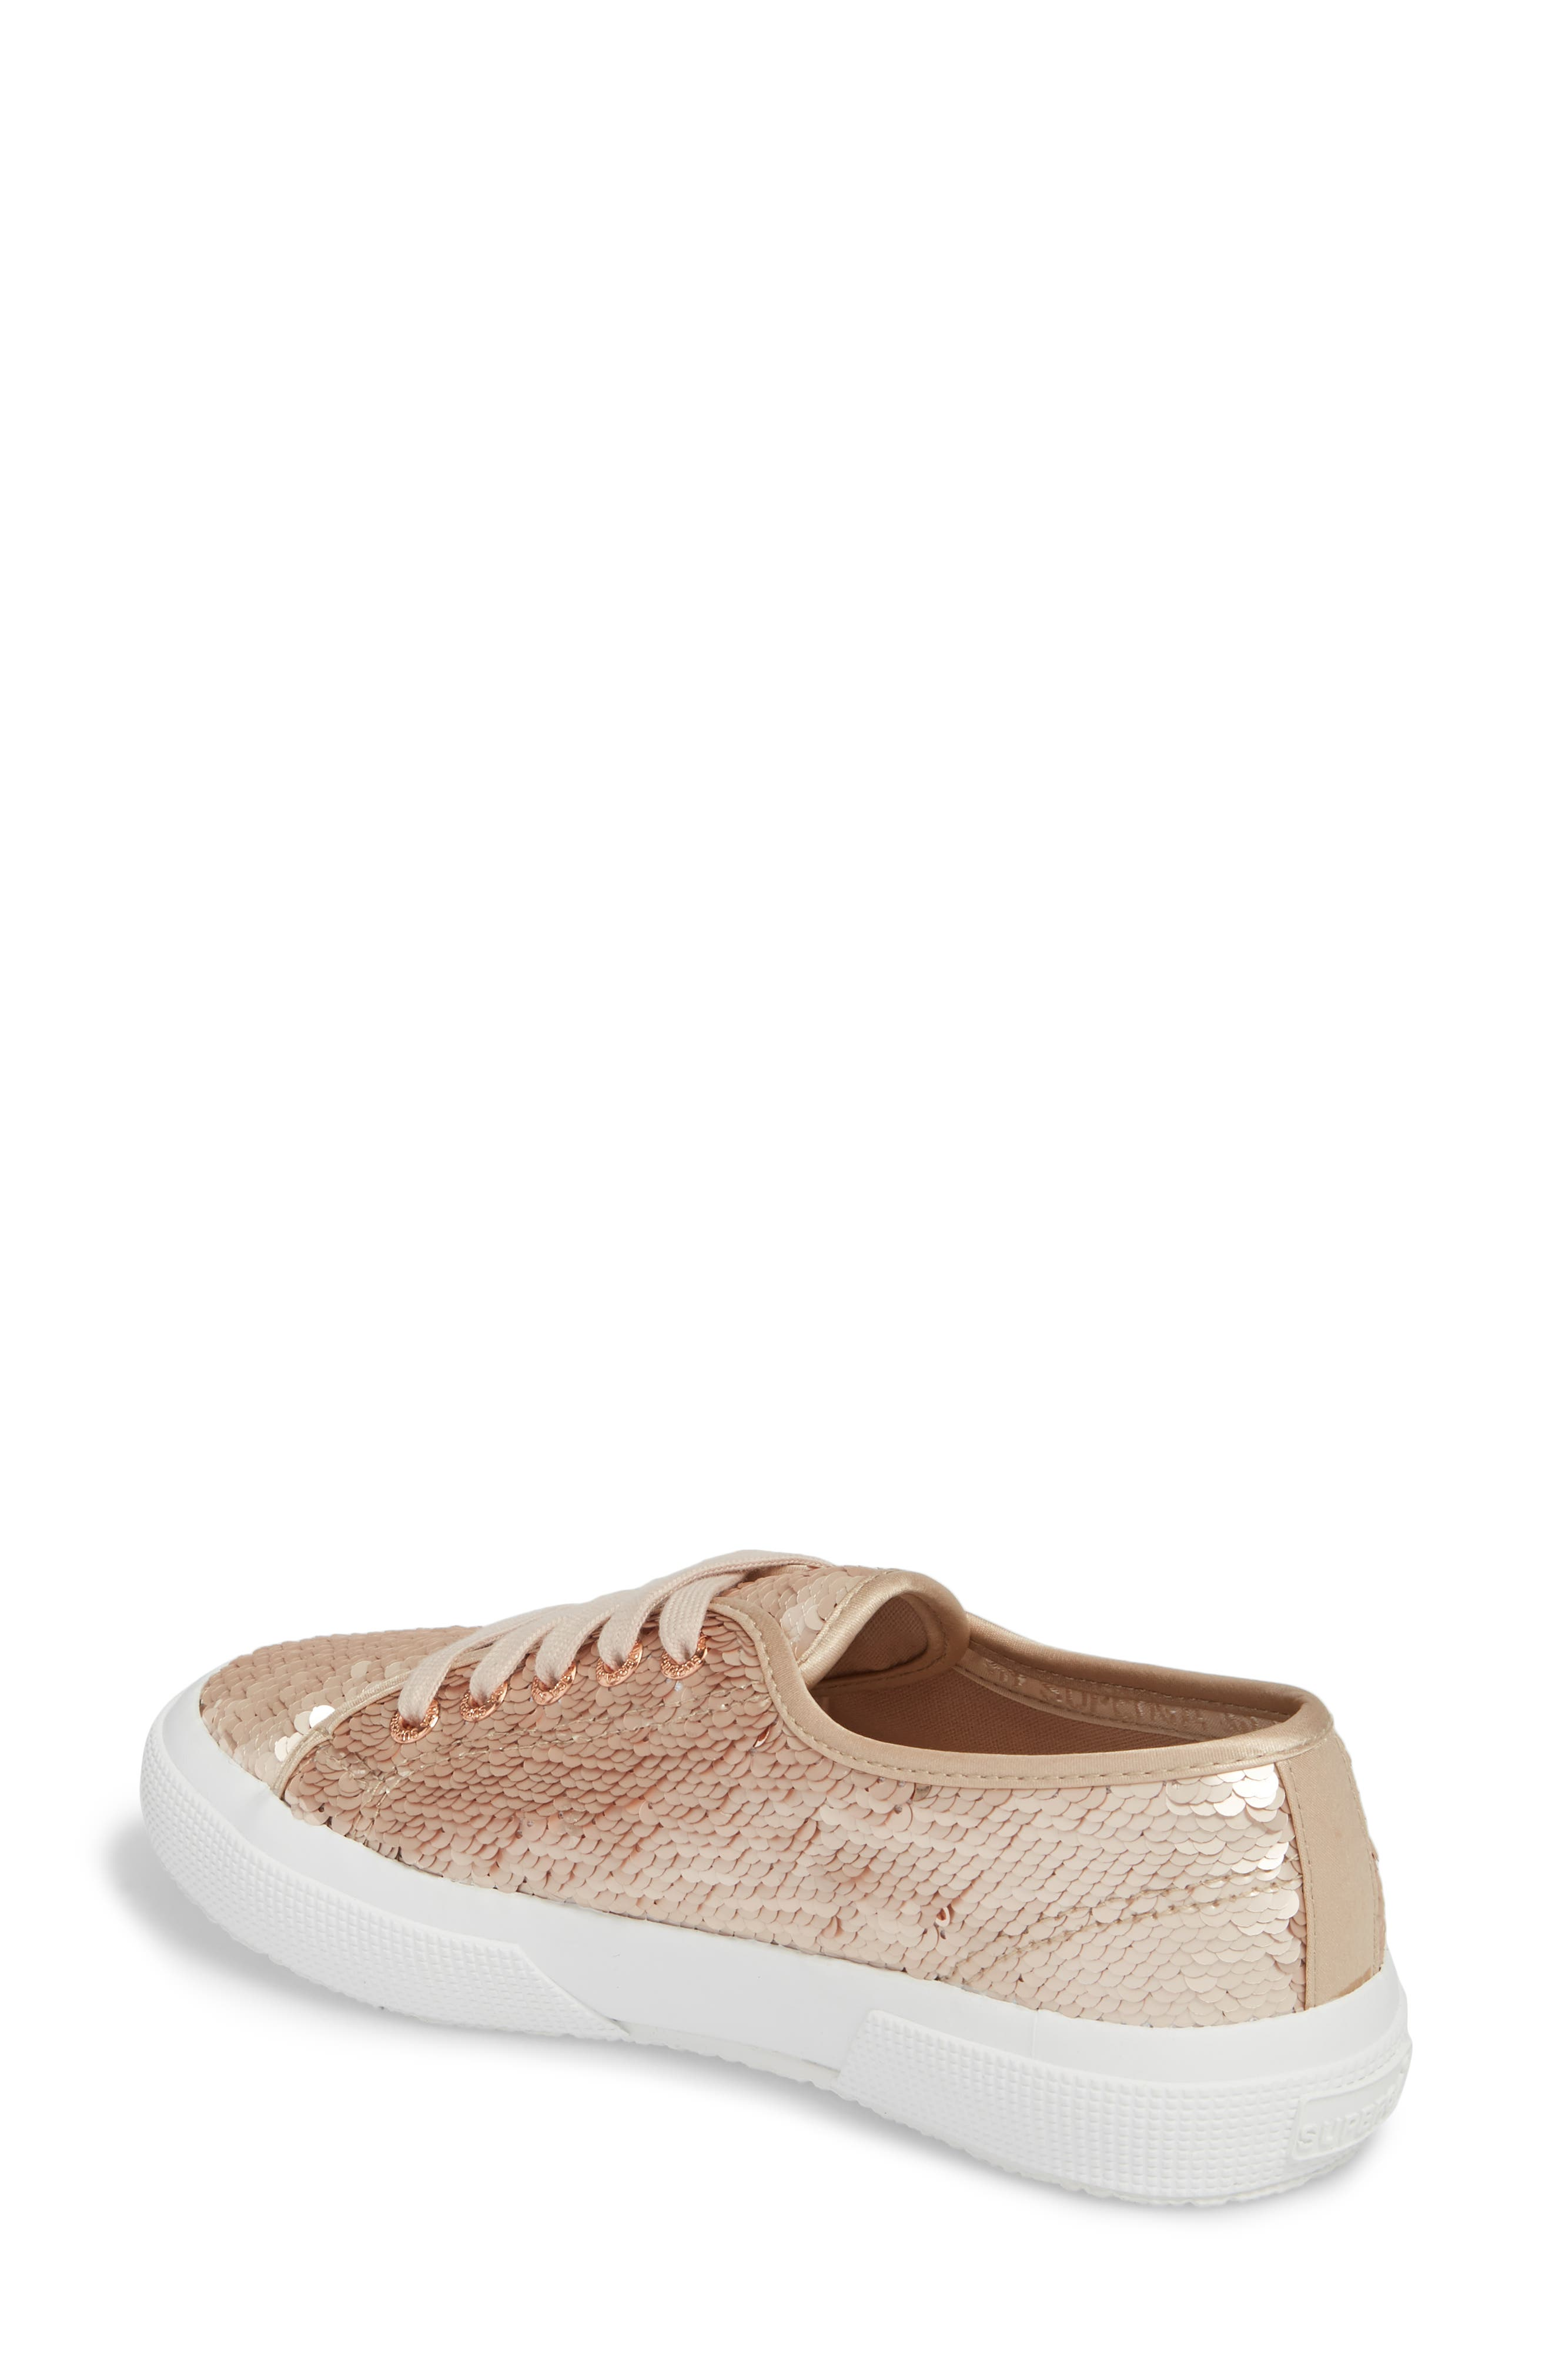 2750 Pairidescent Low Top Sneaker,                             Alternate thumbnail 2, color,                             687